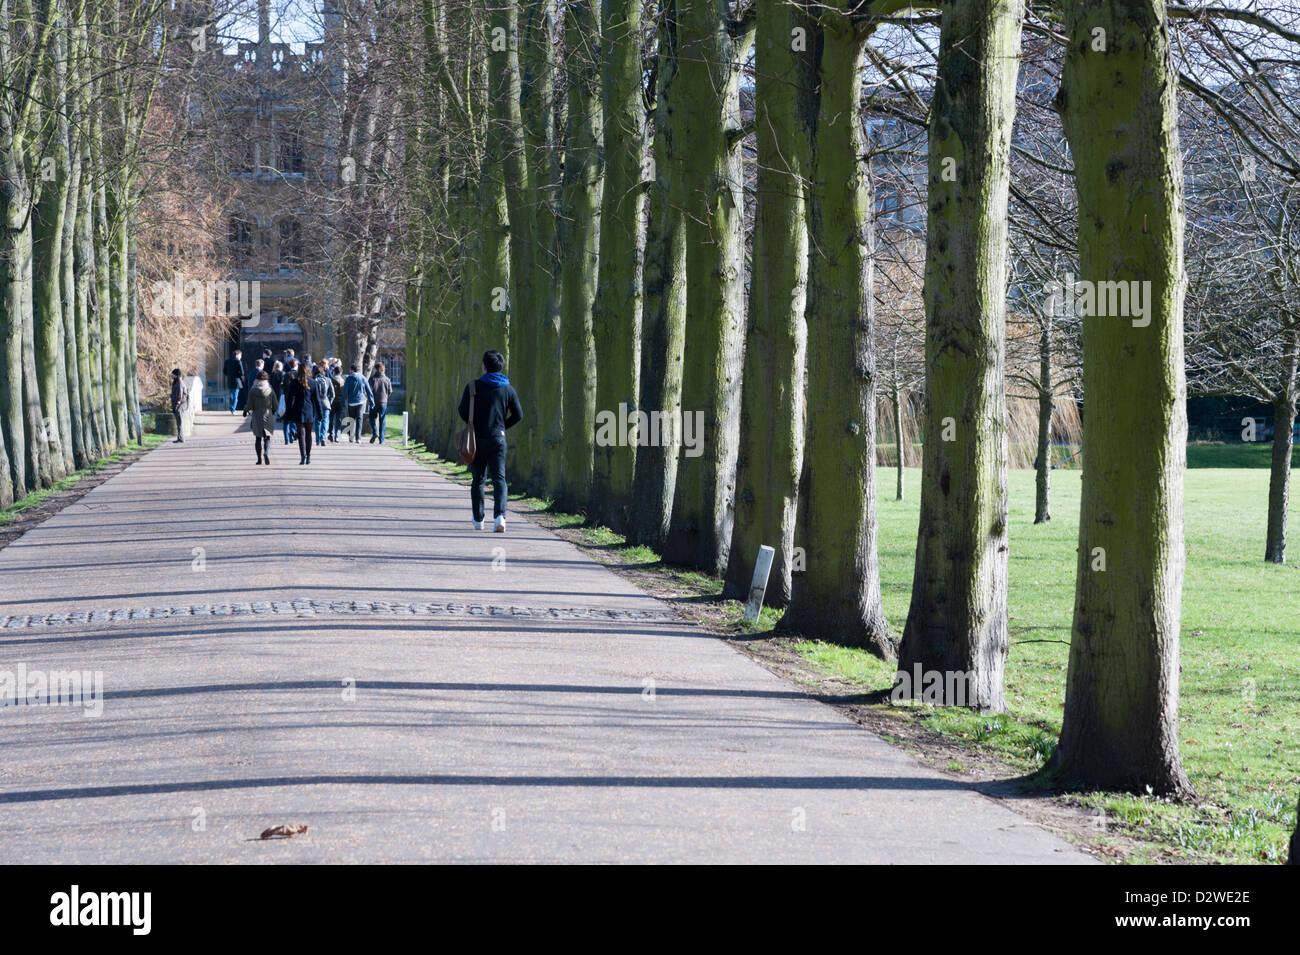 Avenue of trees at the rear of St John's College Cambridge University UK - Stock Image